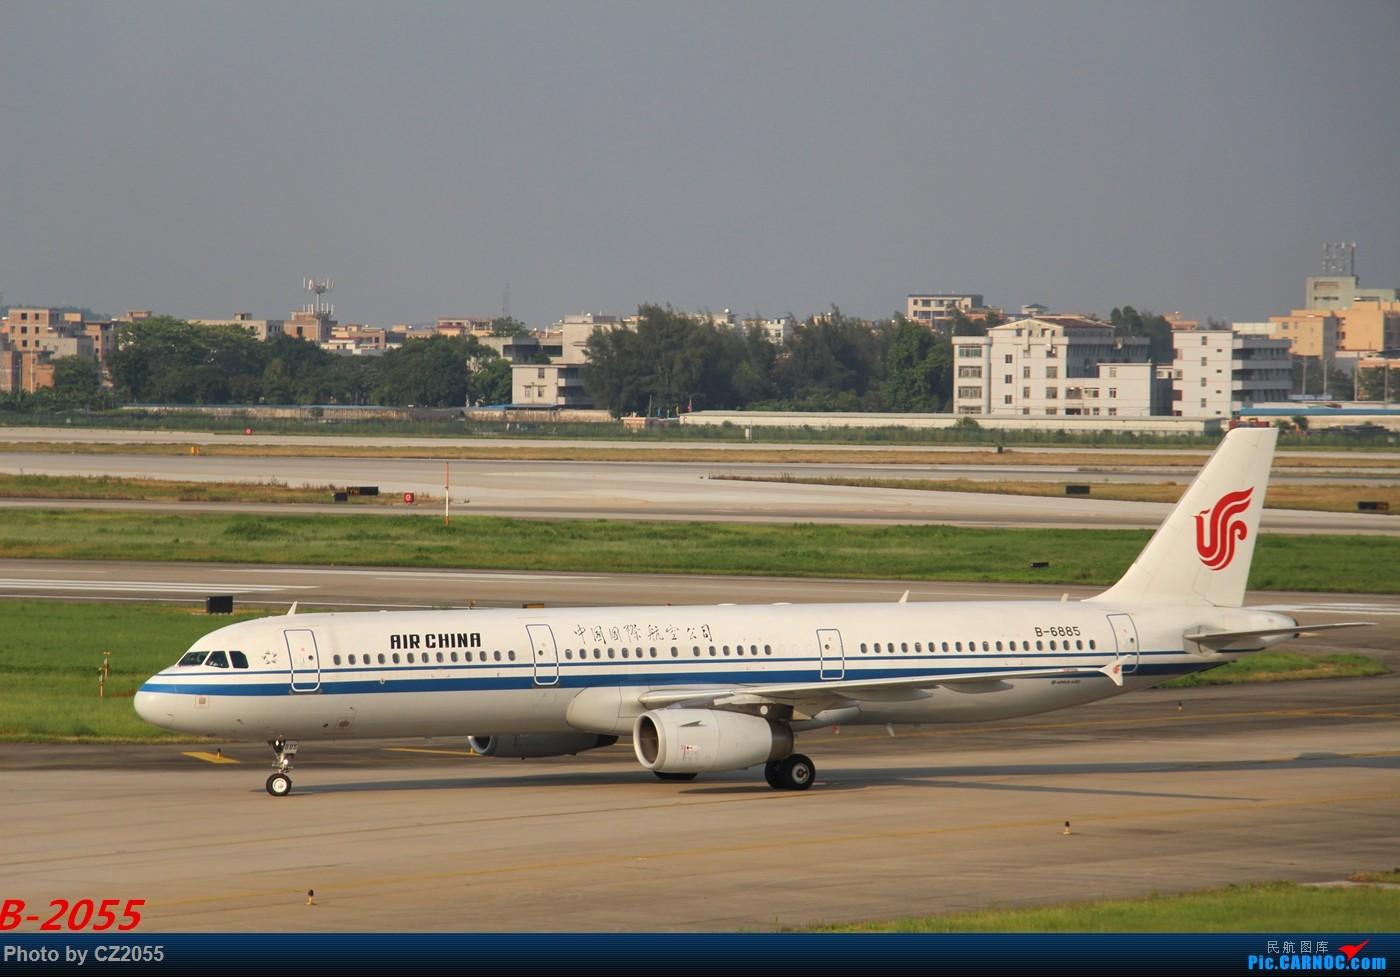 Re:[原创]Re:[原创]【广东青少年拍机小队】【C-Z-2055】发完737和宽体就升级320,那就再发一组320系列。 AIRBUS A321-200 B-6885 中国广州白云国际机场